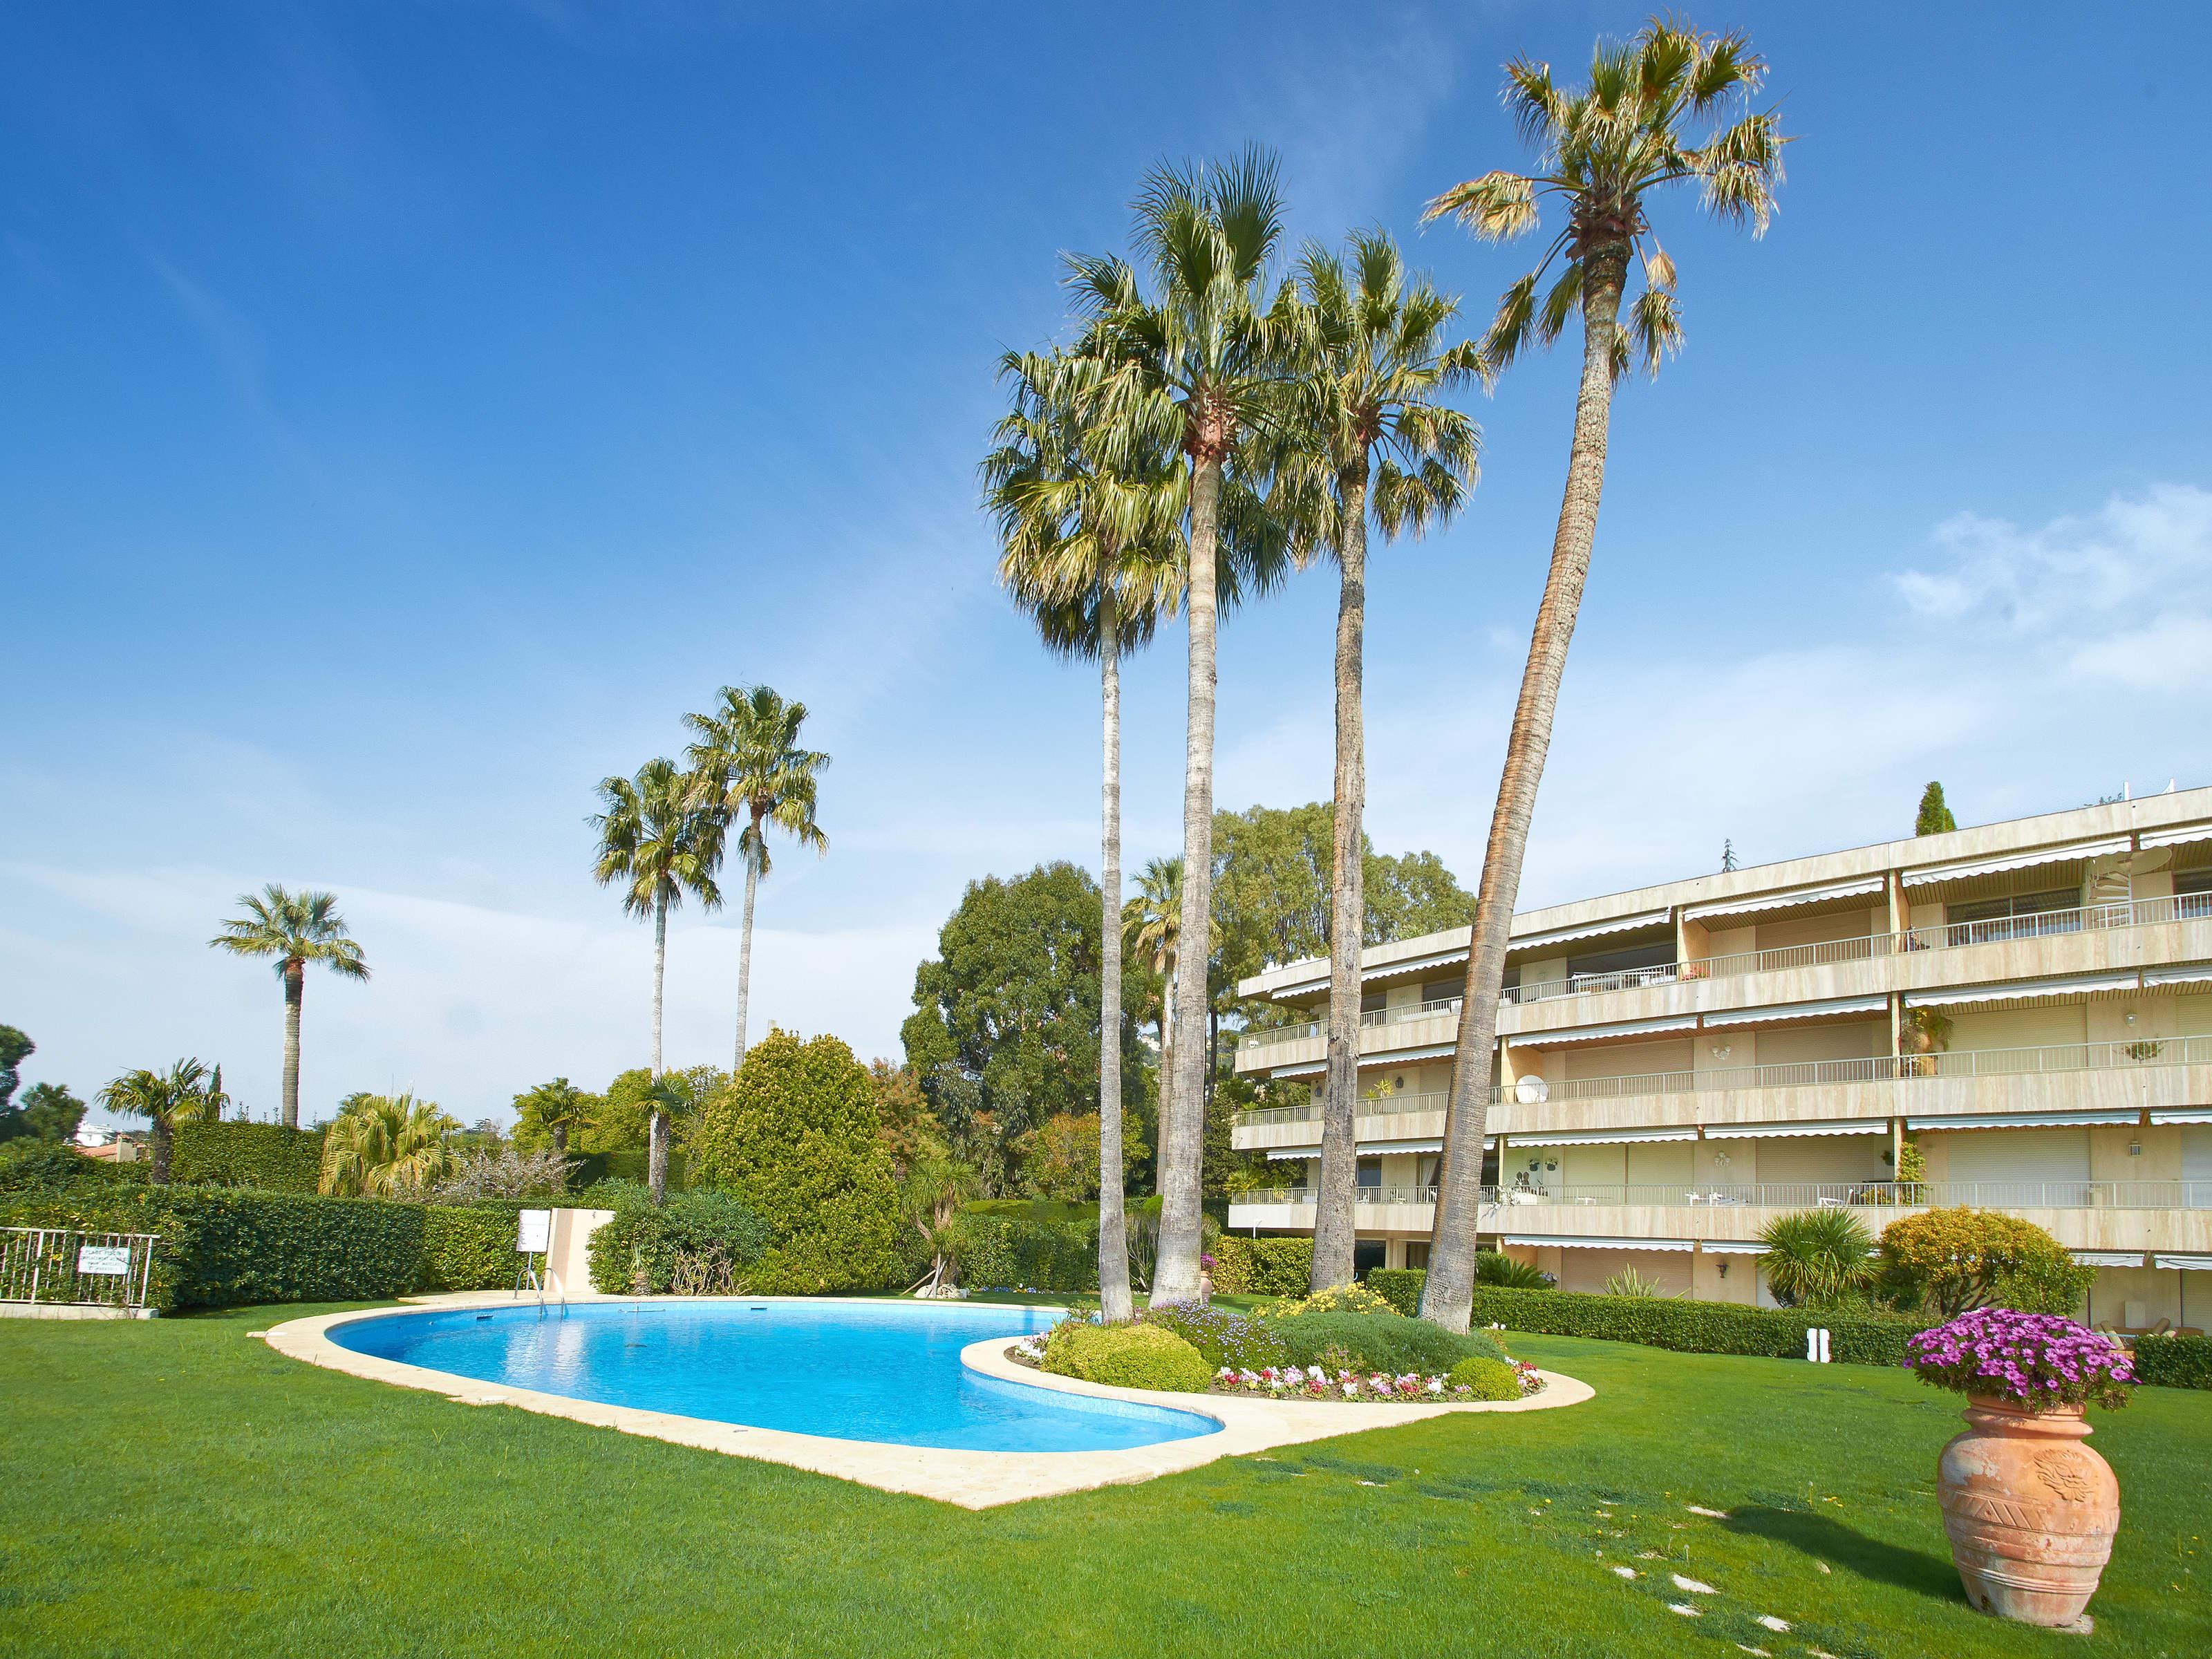 独户住宅 为 销售 在 Luxurious 4 rooms apartment with sea view in Cannes Californie Cannes, 普罗旺斯阿尔卑斯蓝色海岸 06400 法国